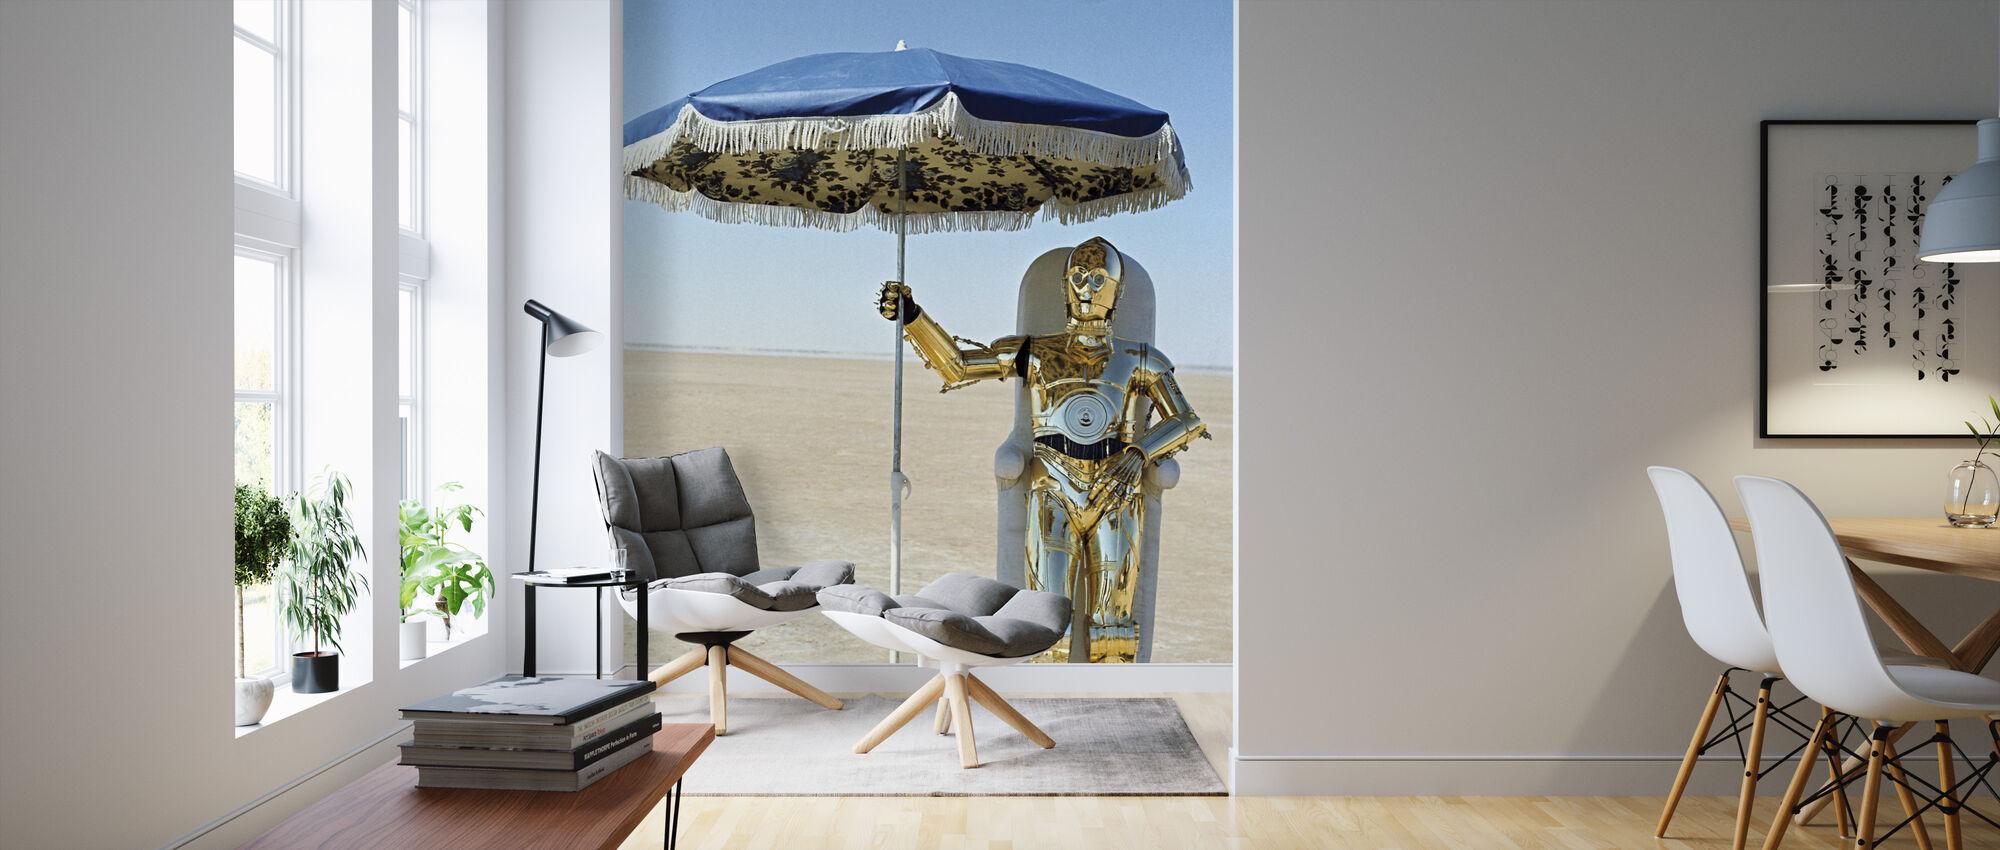 New Hope - George Lucas - Wallpaper - Living Room